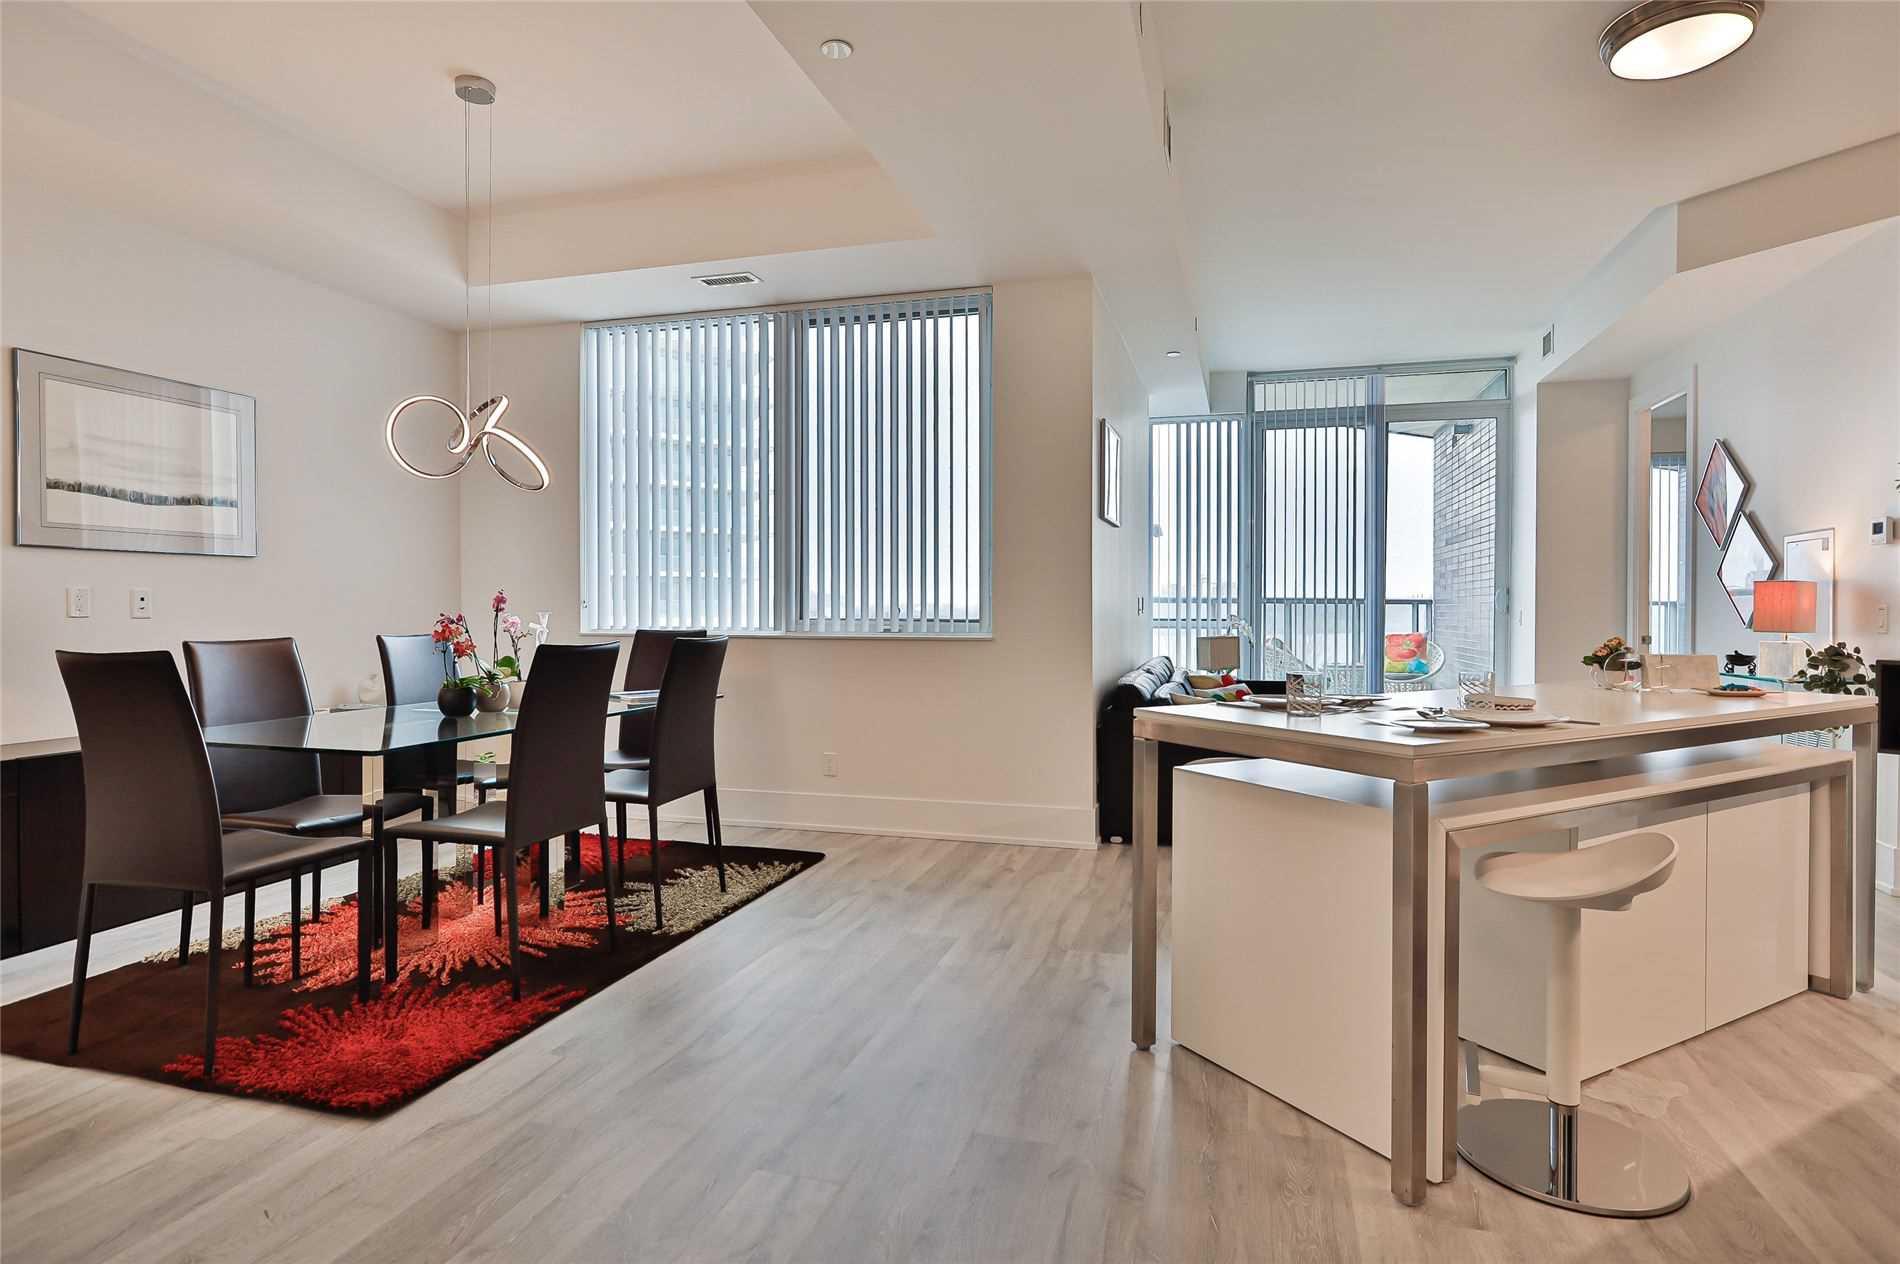 Condo Apt For Sale In Toronto , 2 Bedrooms Bedrooms, ,2 BathroomsBathrooms,Condo Apt,For Sale,217,Edgewater